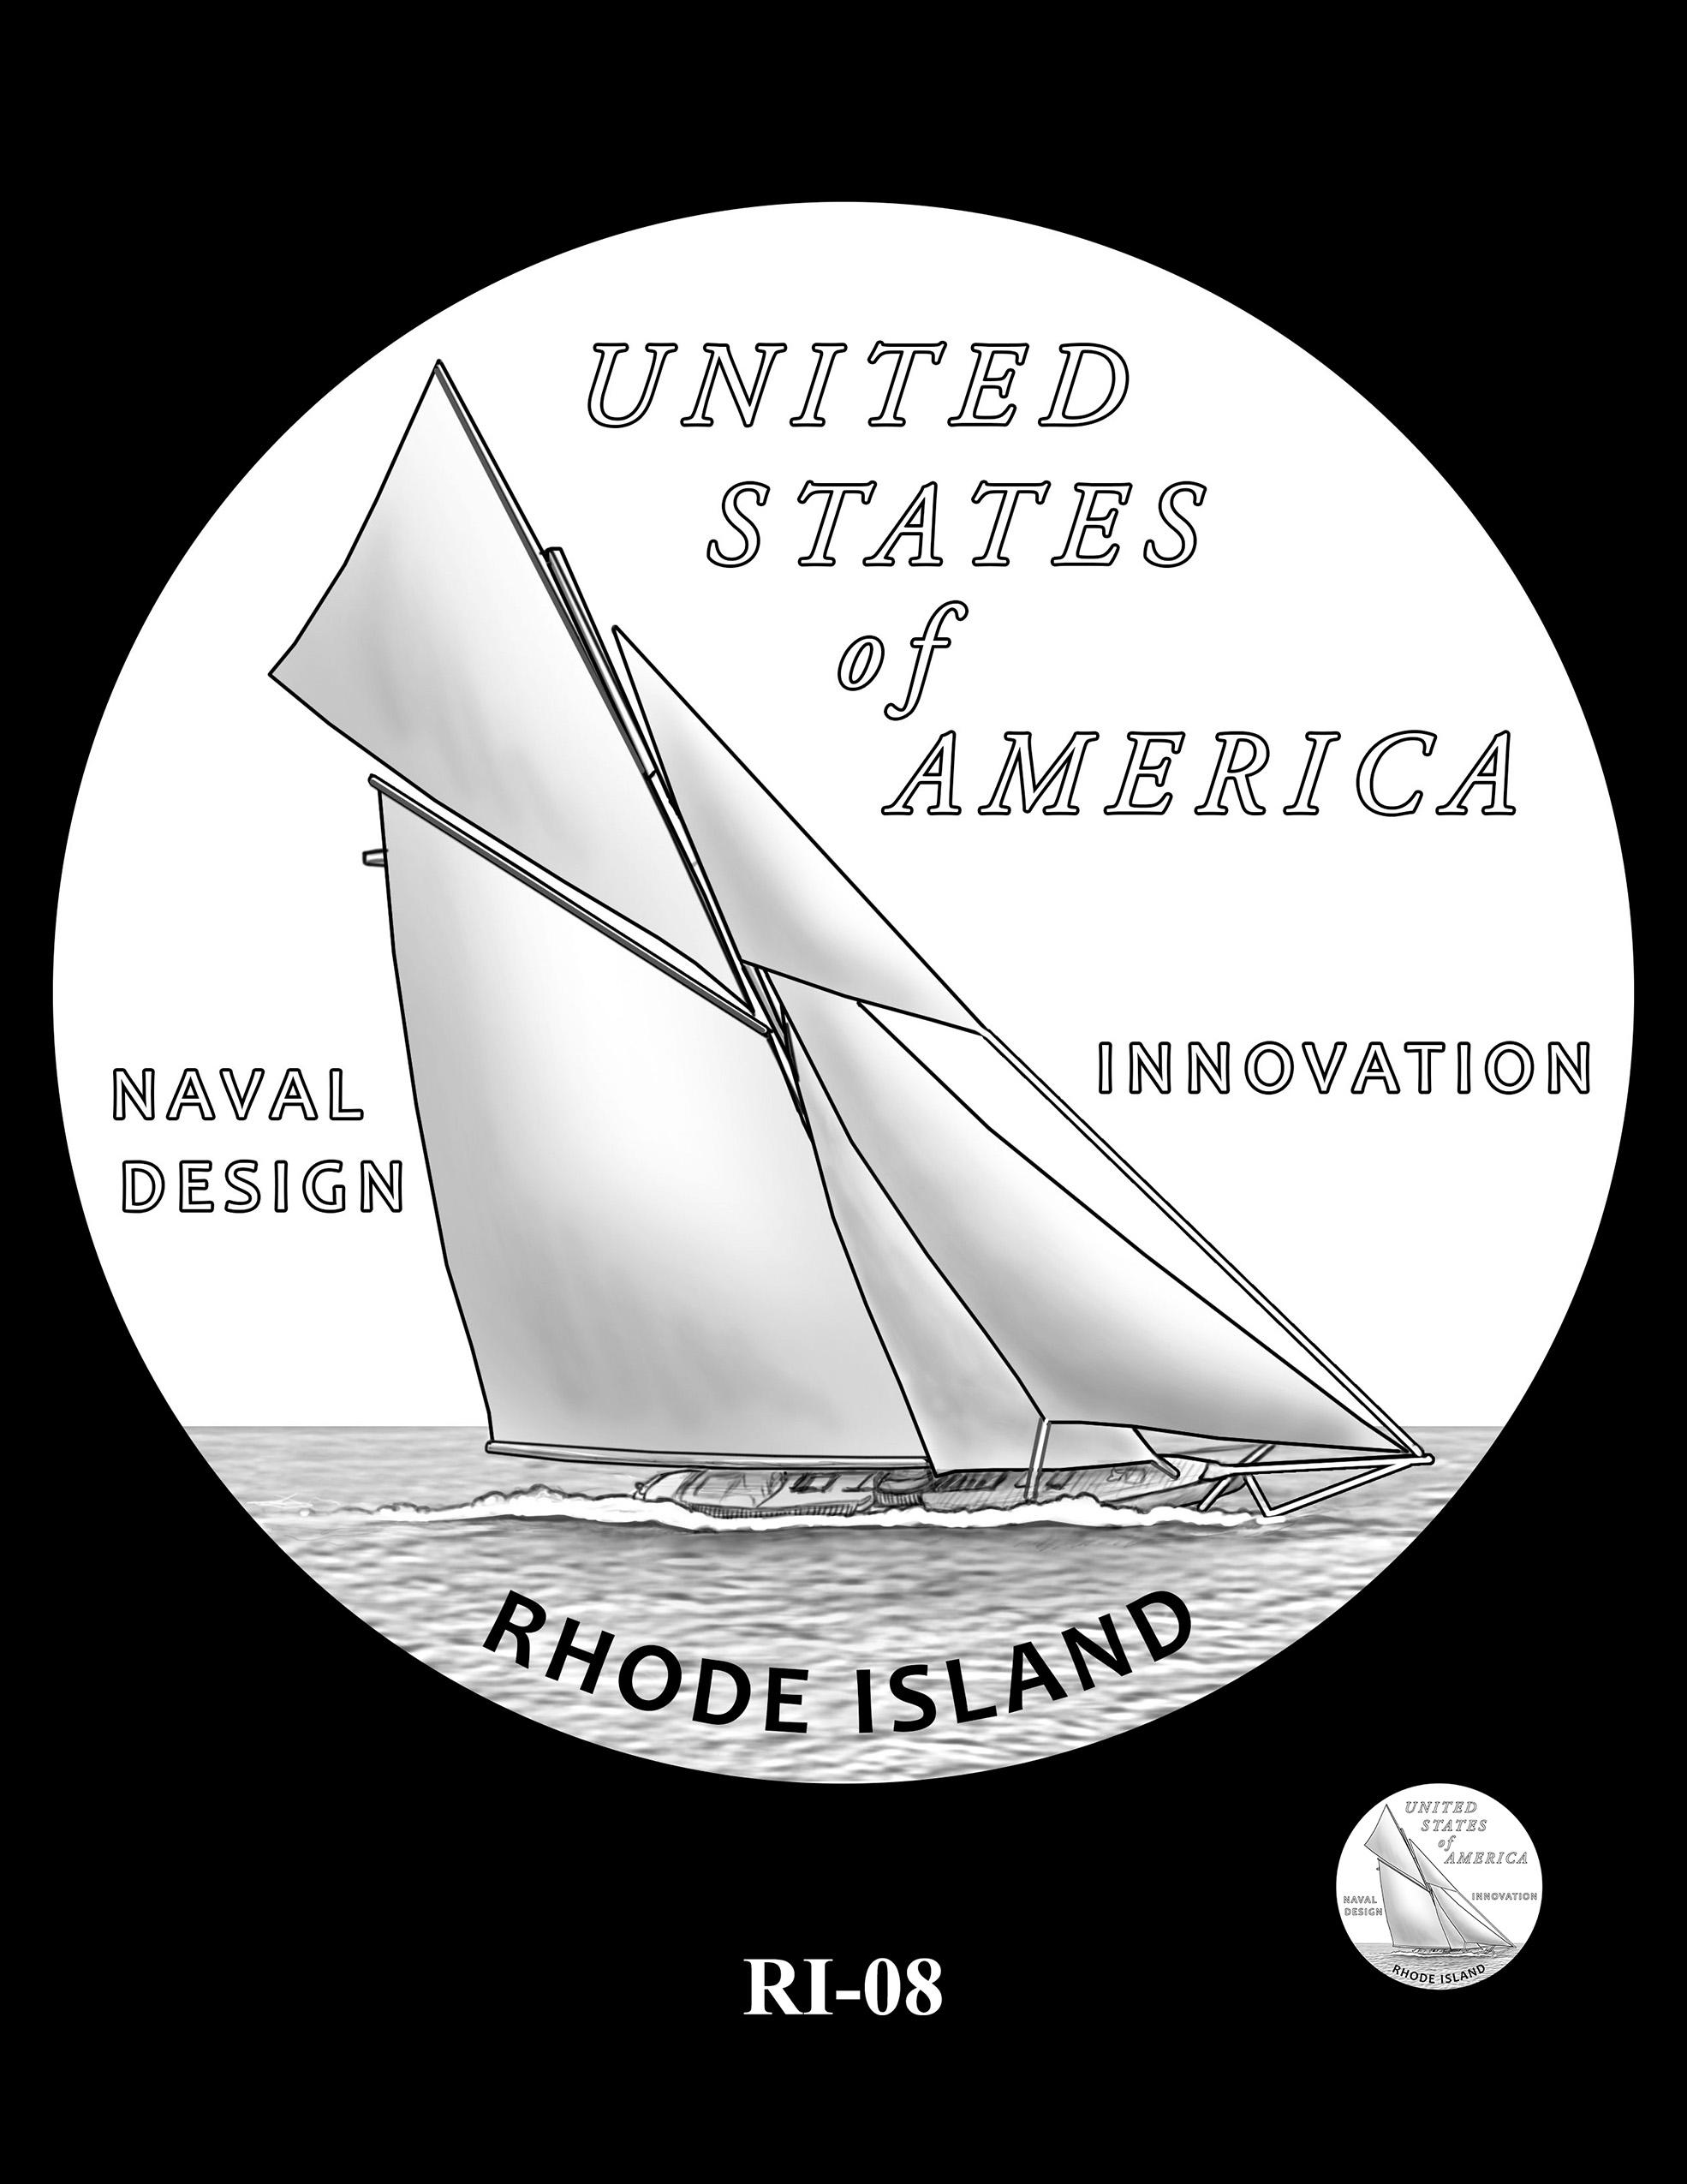 RI-08 -- 2022 American Innovation $1 Coin - Rhode Island